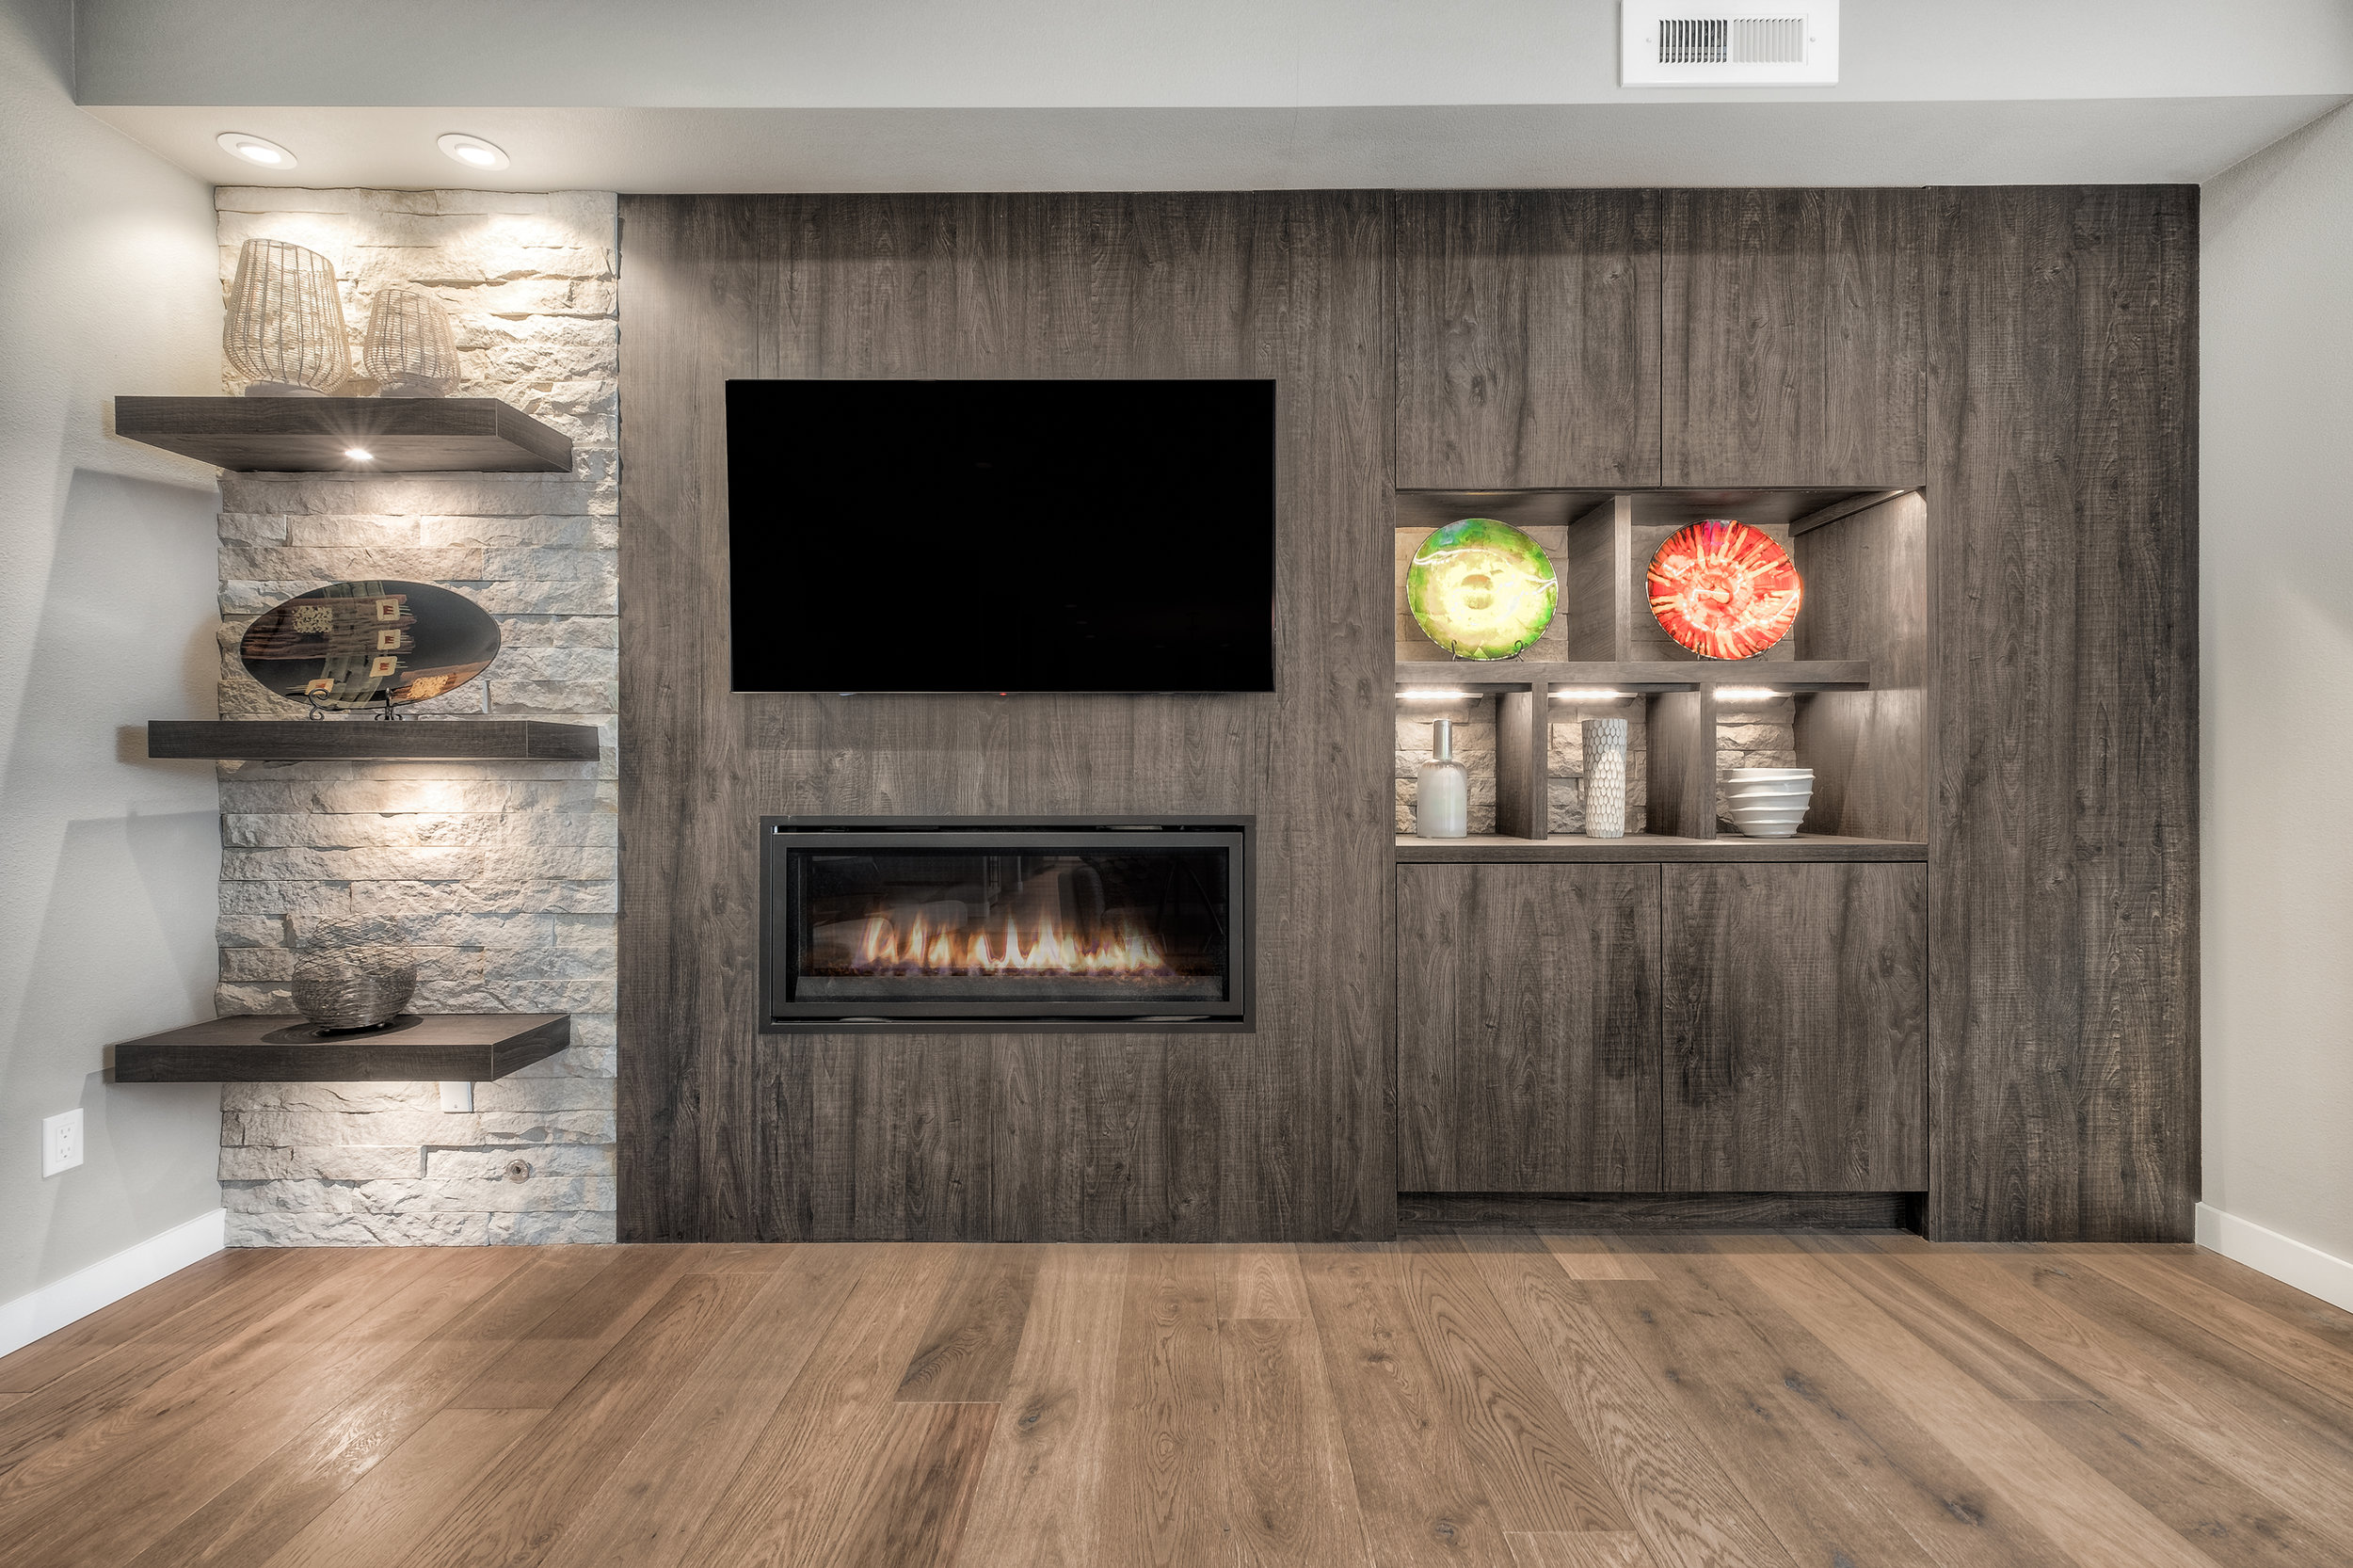 Fireplace & Flooring